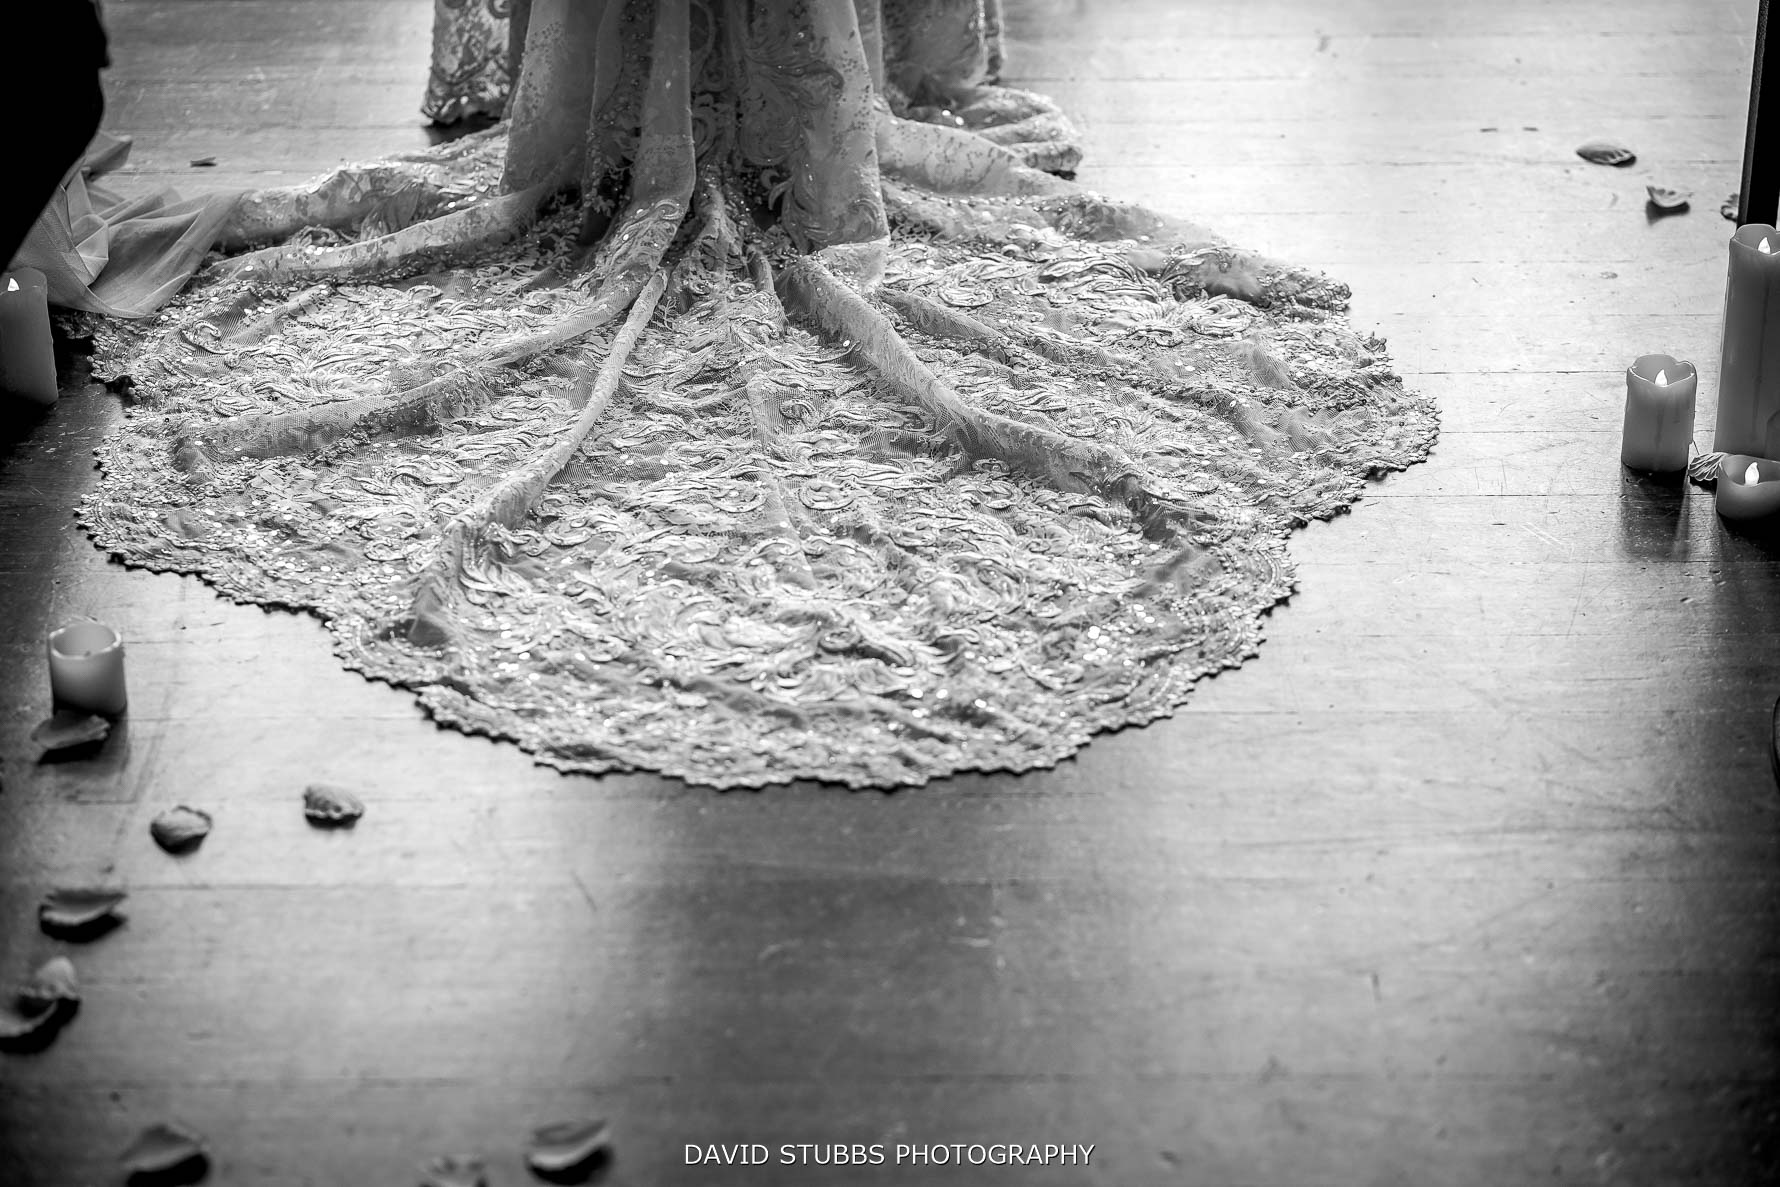 wedding dress photo during vows